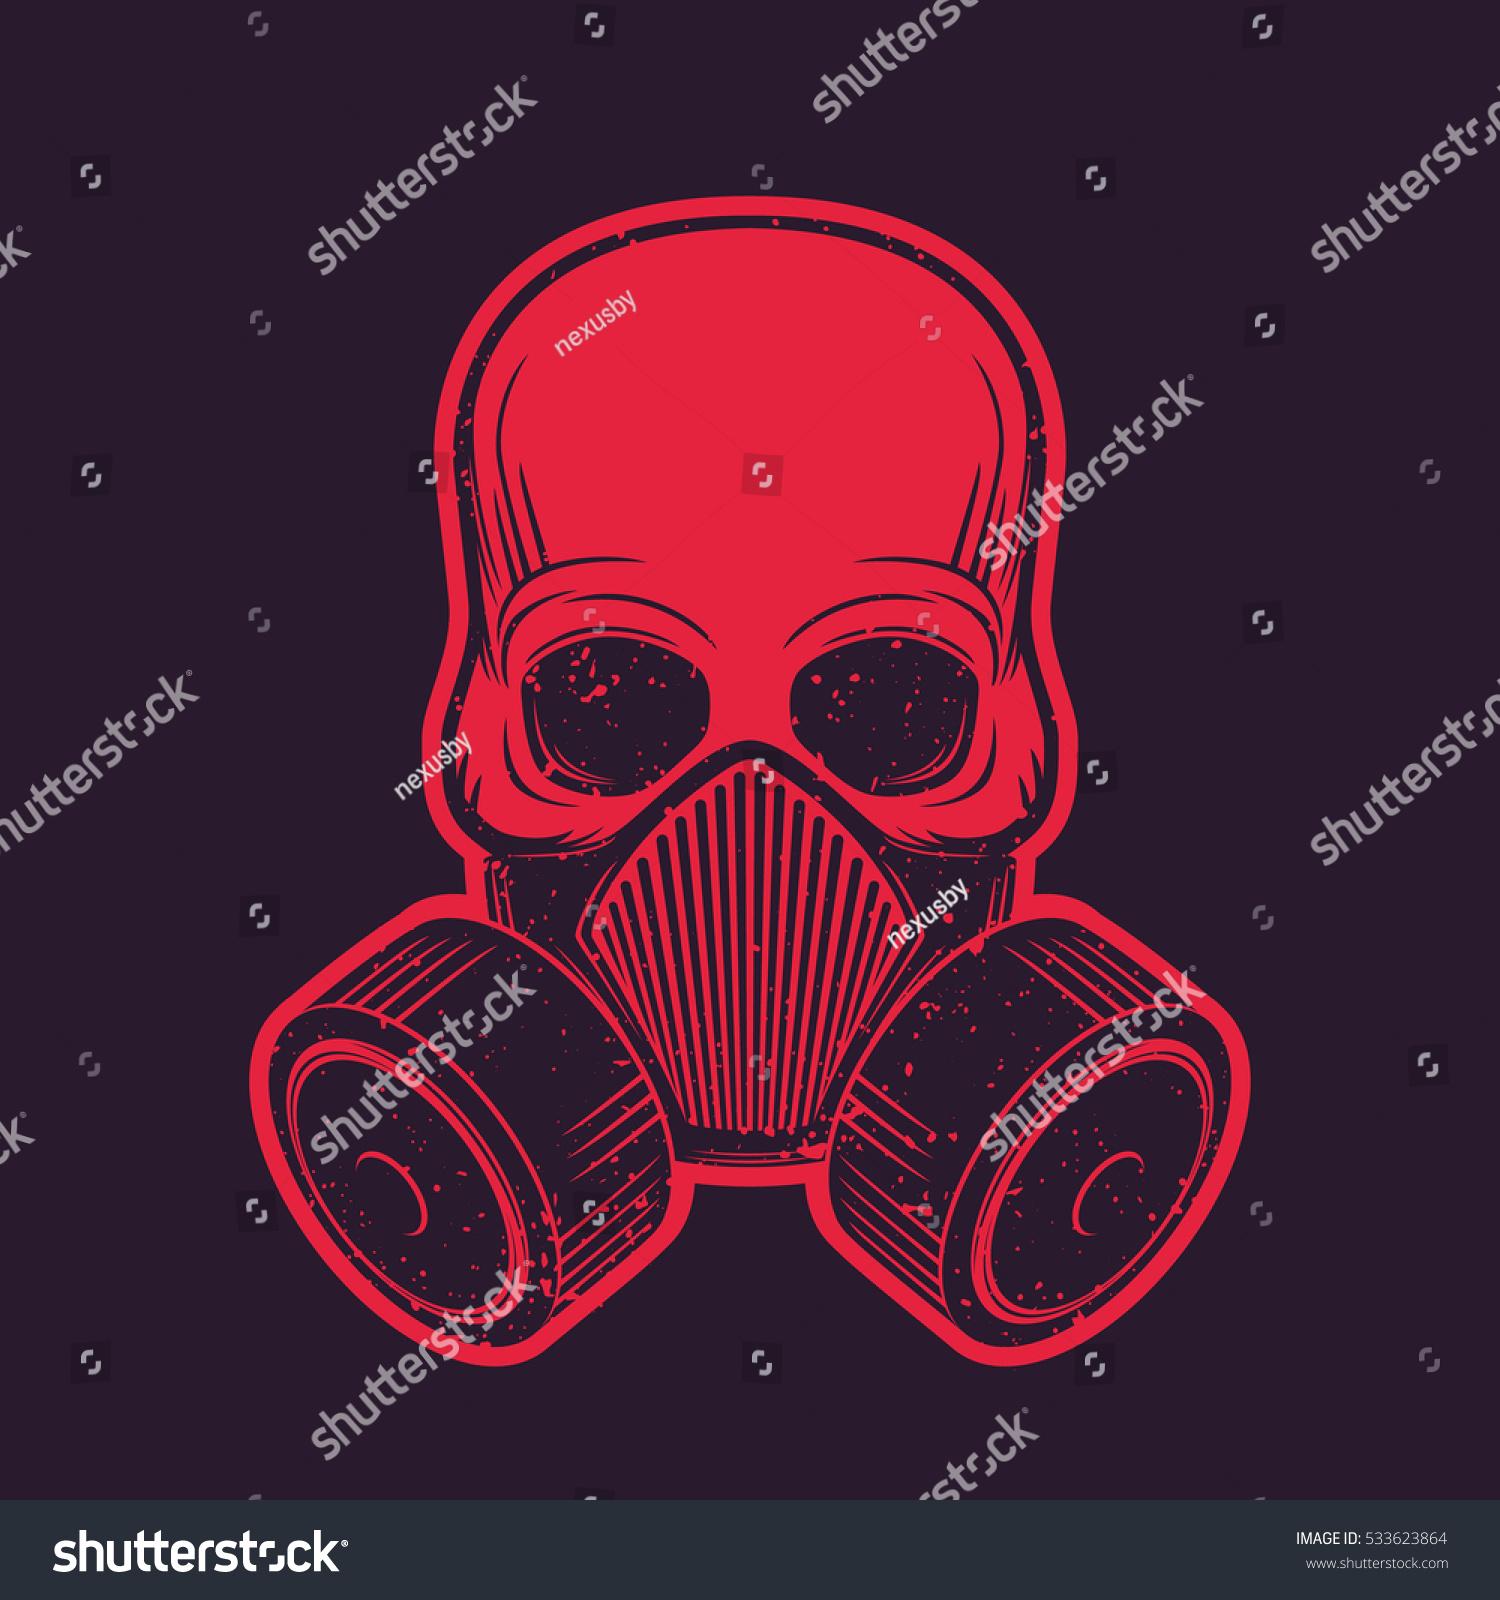 Shirt design equipment - Skull With Respirator Gas Mask T Shirt Design